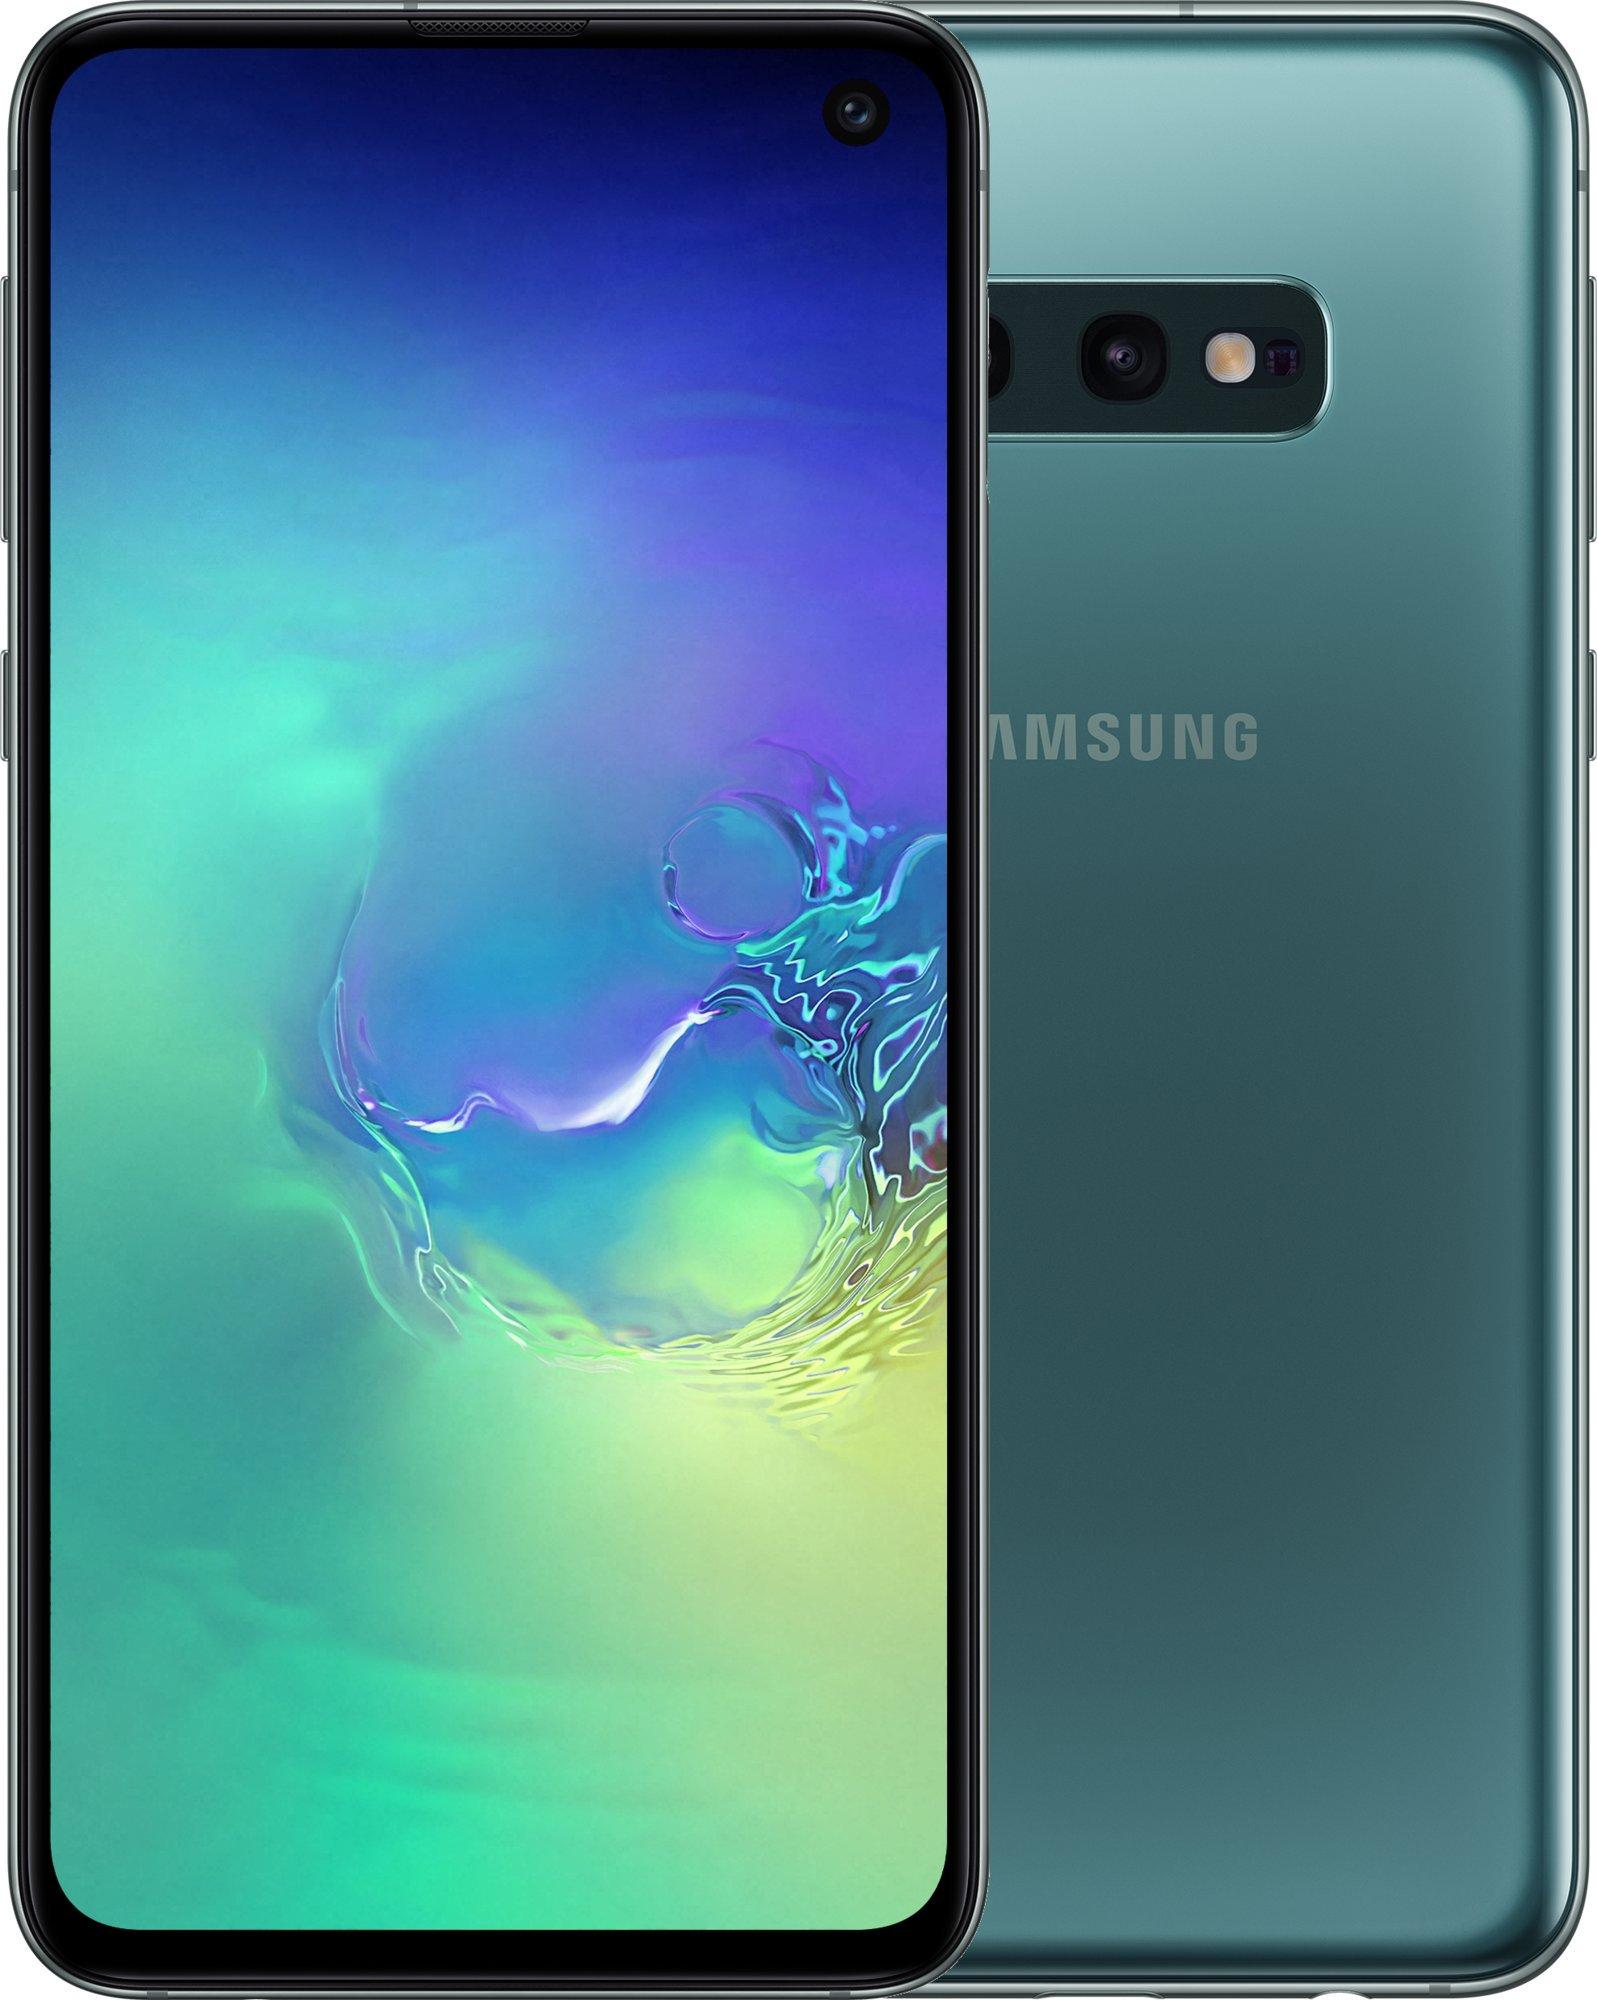 Samsung Galaxy S10e 128GB Dual Sim, Green